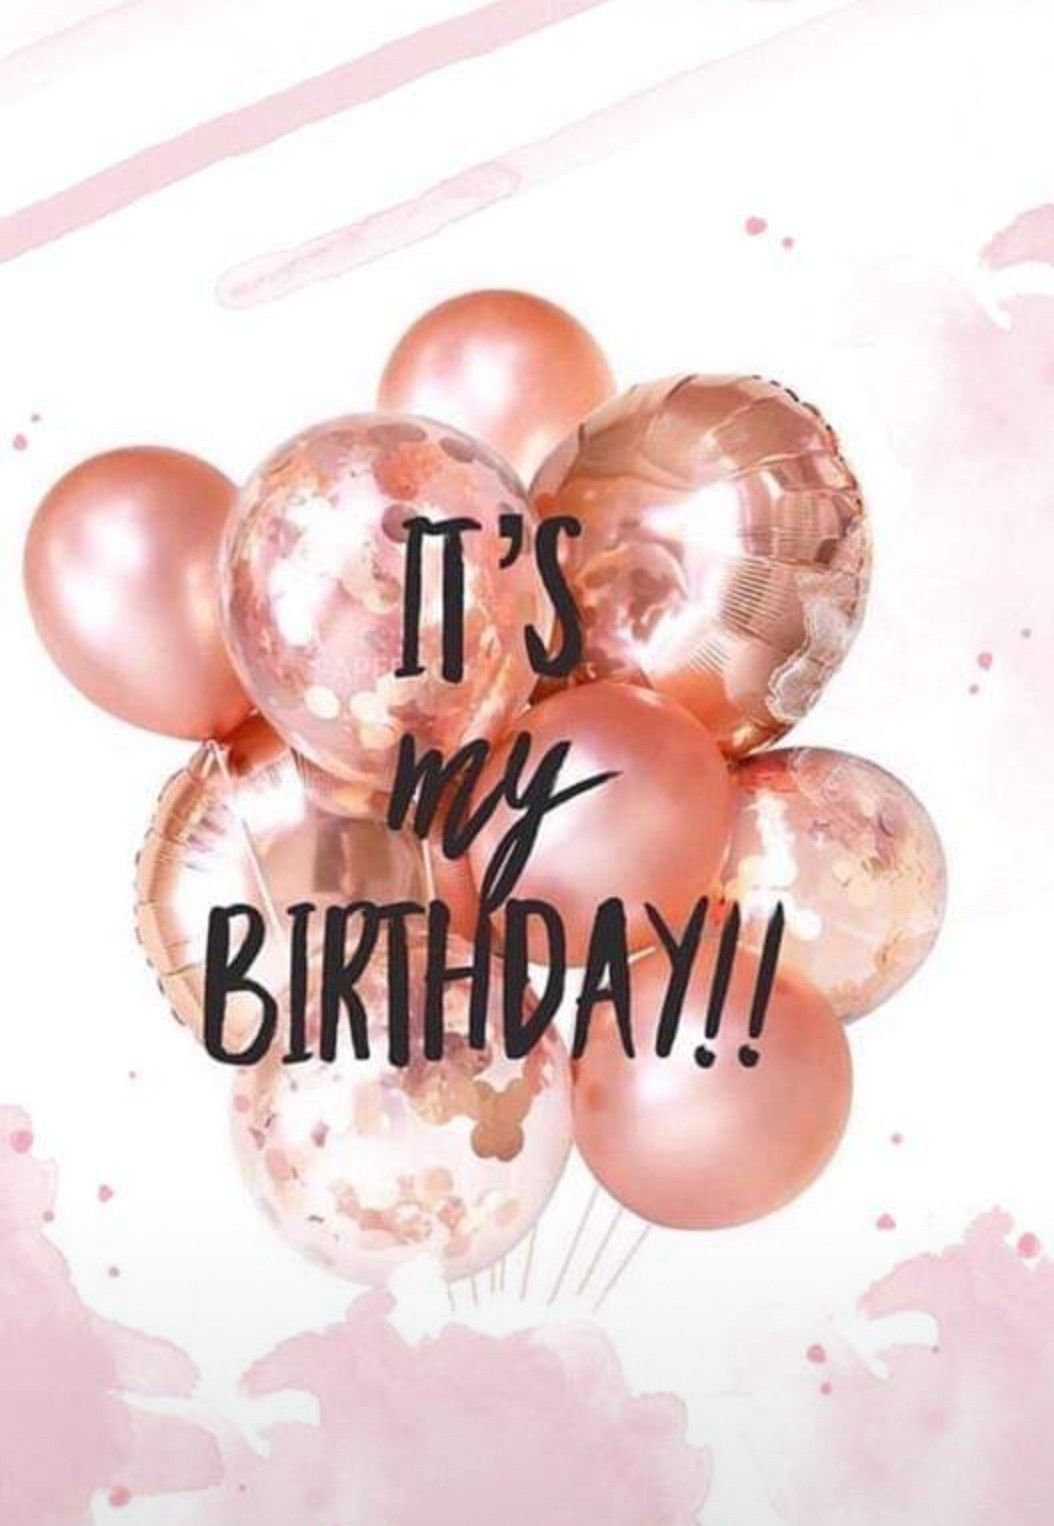 Happy Birthday To Mee In 2020 Geburtstag Hintergrundbild Heute